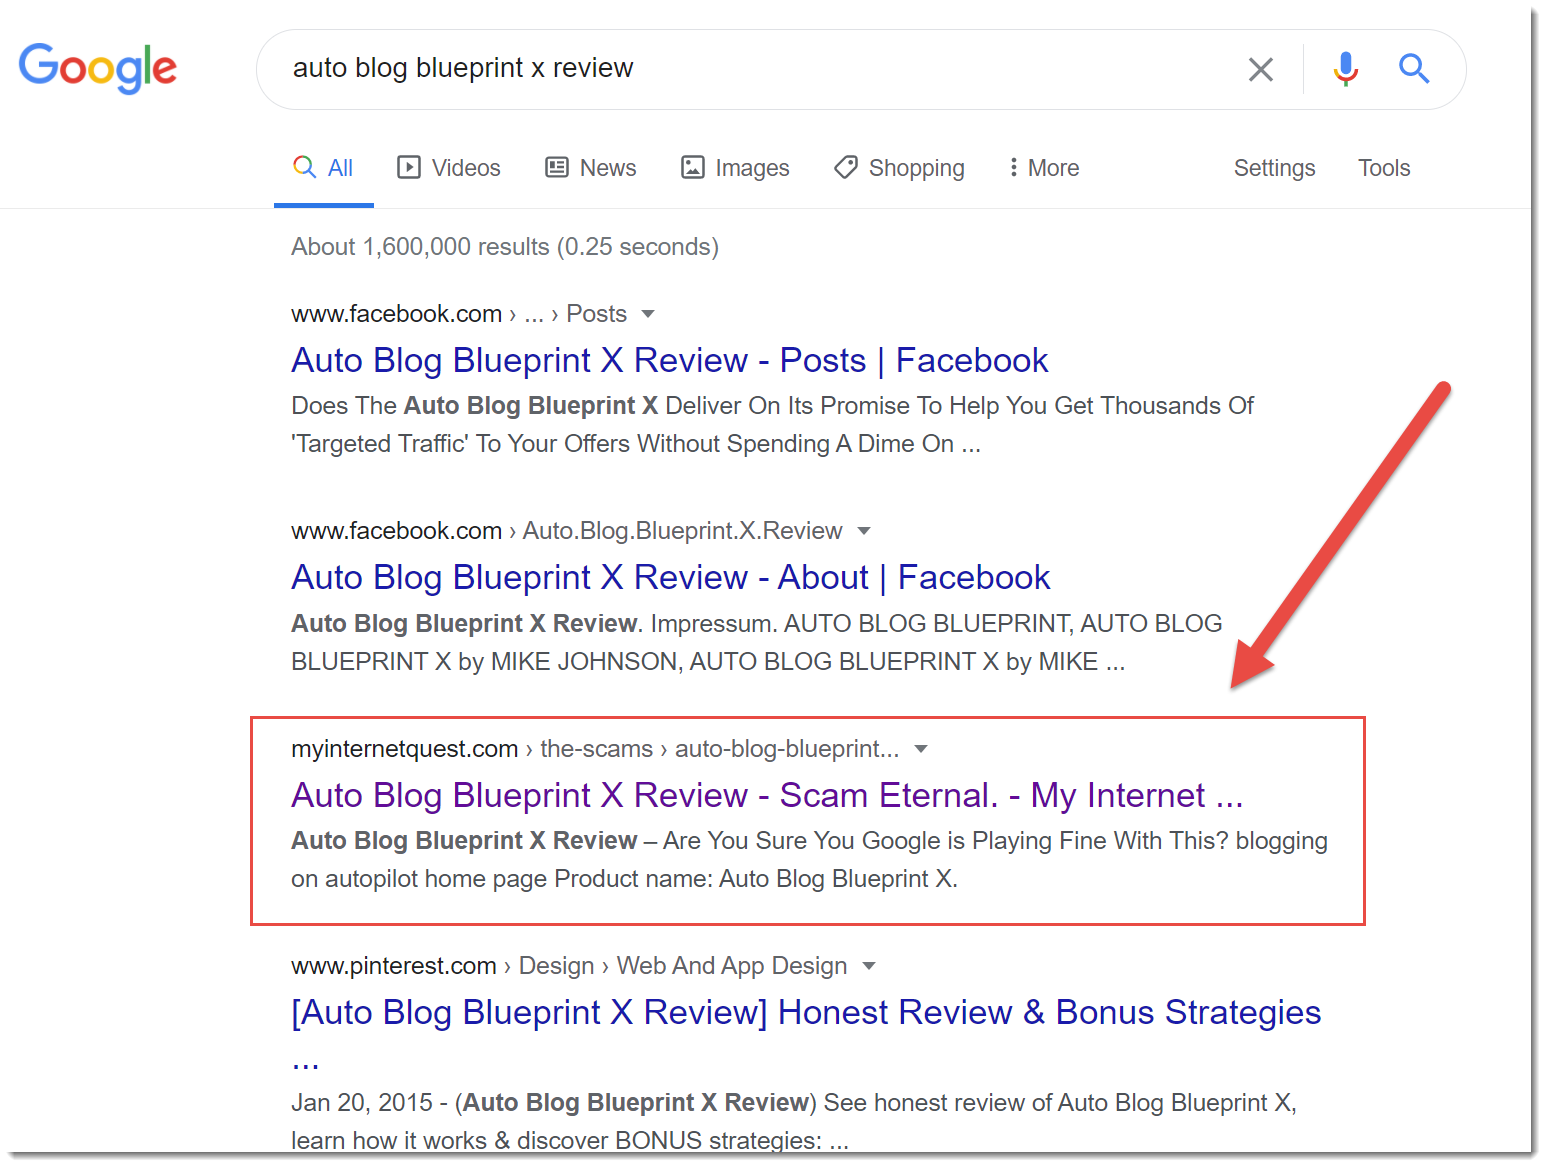 autoblog blueprint x google search results